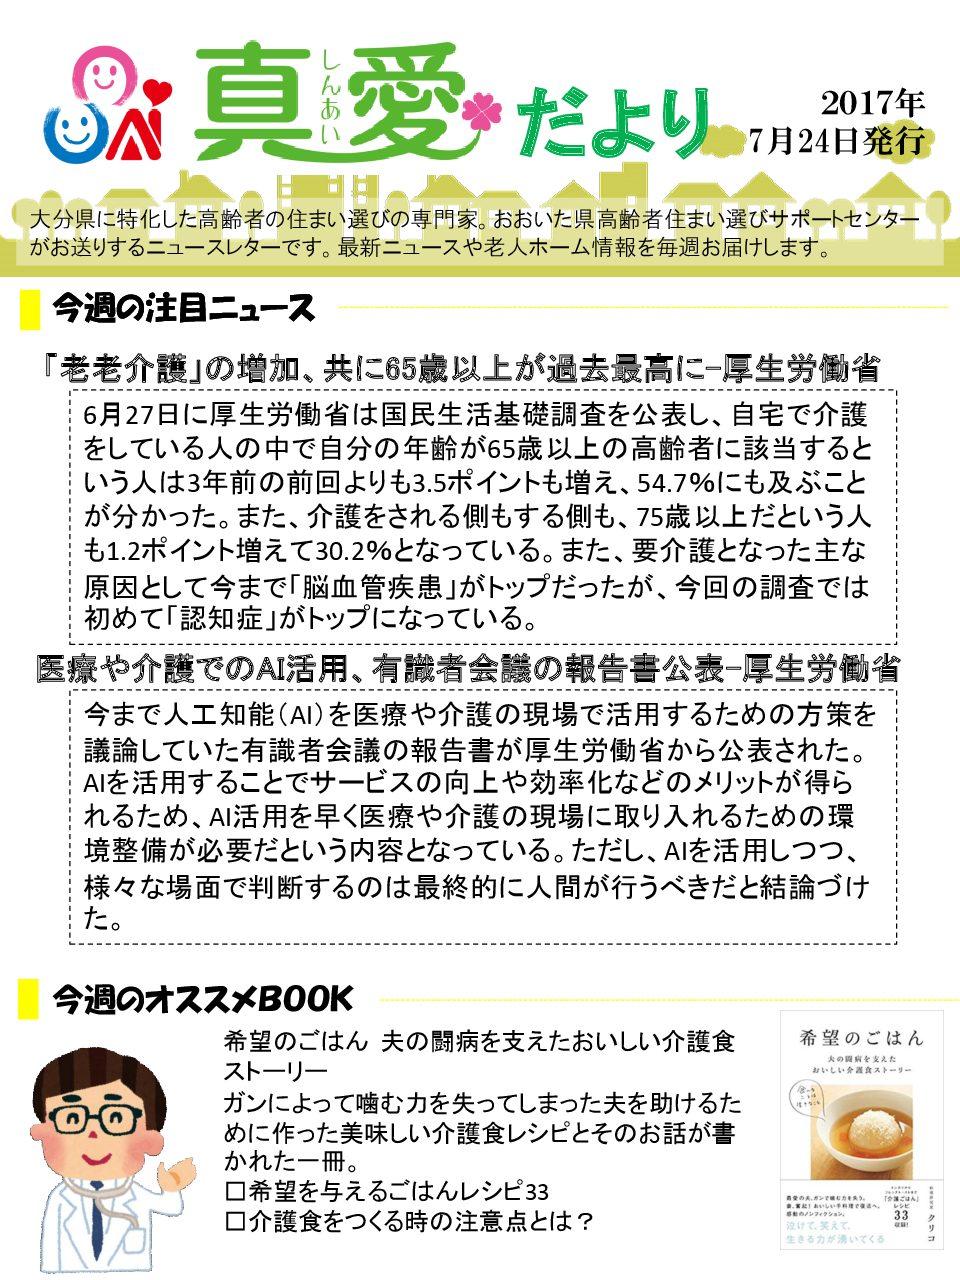 【Vol.3】 2017.07.24発行